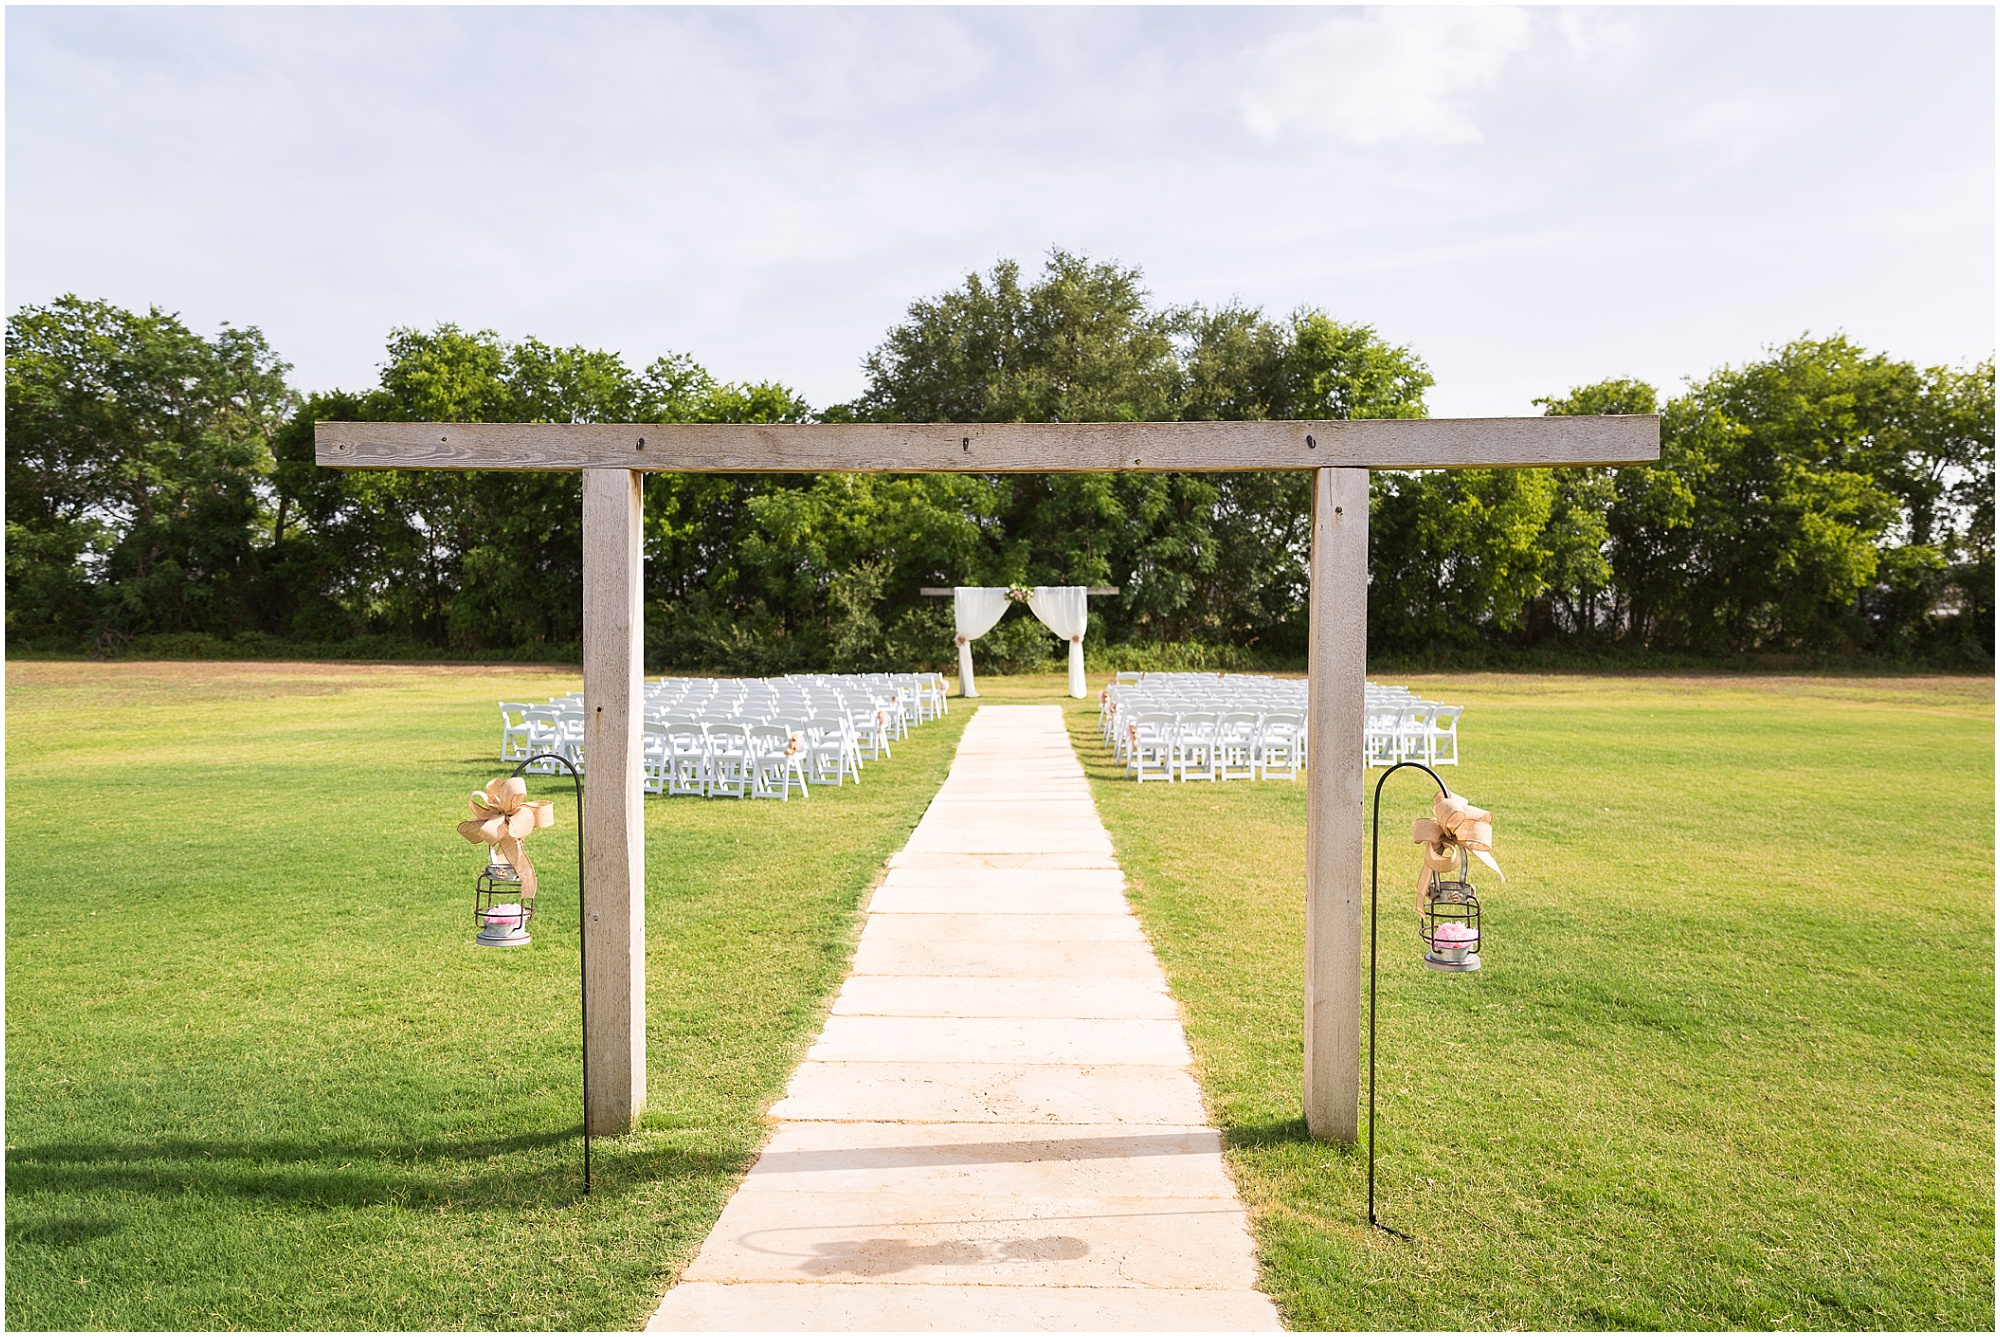 Rustic outdoor summer wedding at Rustic Acres in Belton, Texas - Jason & Melaina Photography - www.jasonandmelaina.com